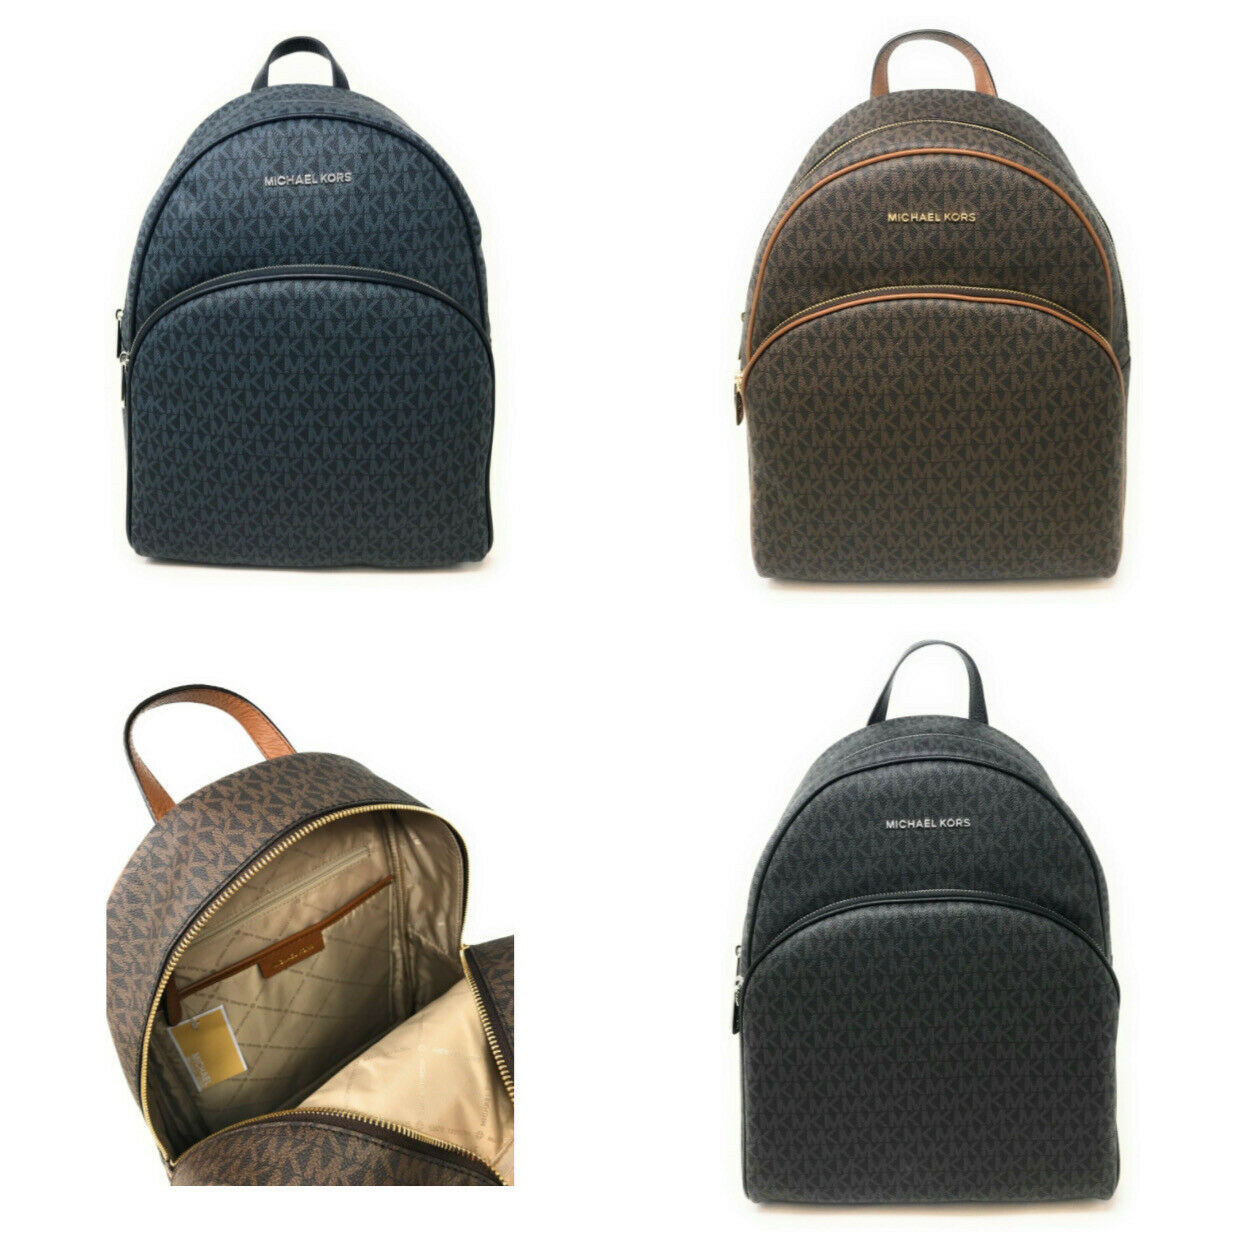 michael-kors-large-abbey-backpack-pvc-leather-trim-signature-448